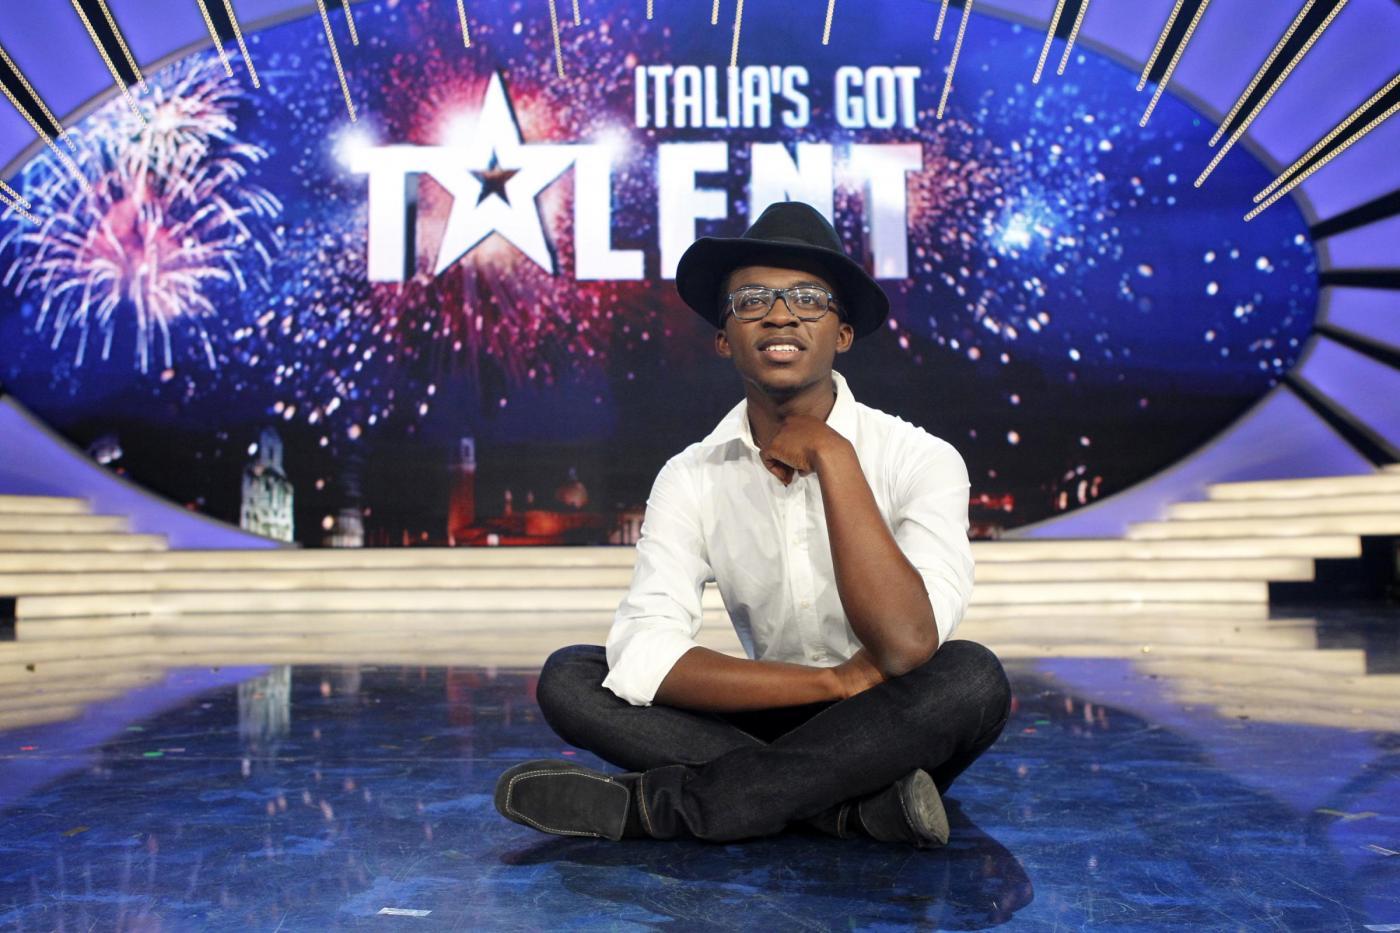 Finale di Italia's got Talent vinta da Daniel Adomako06